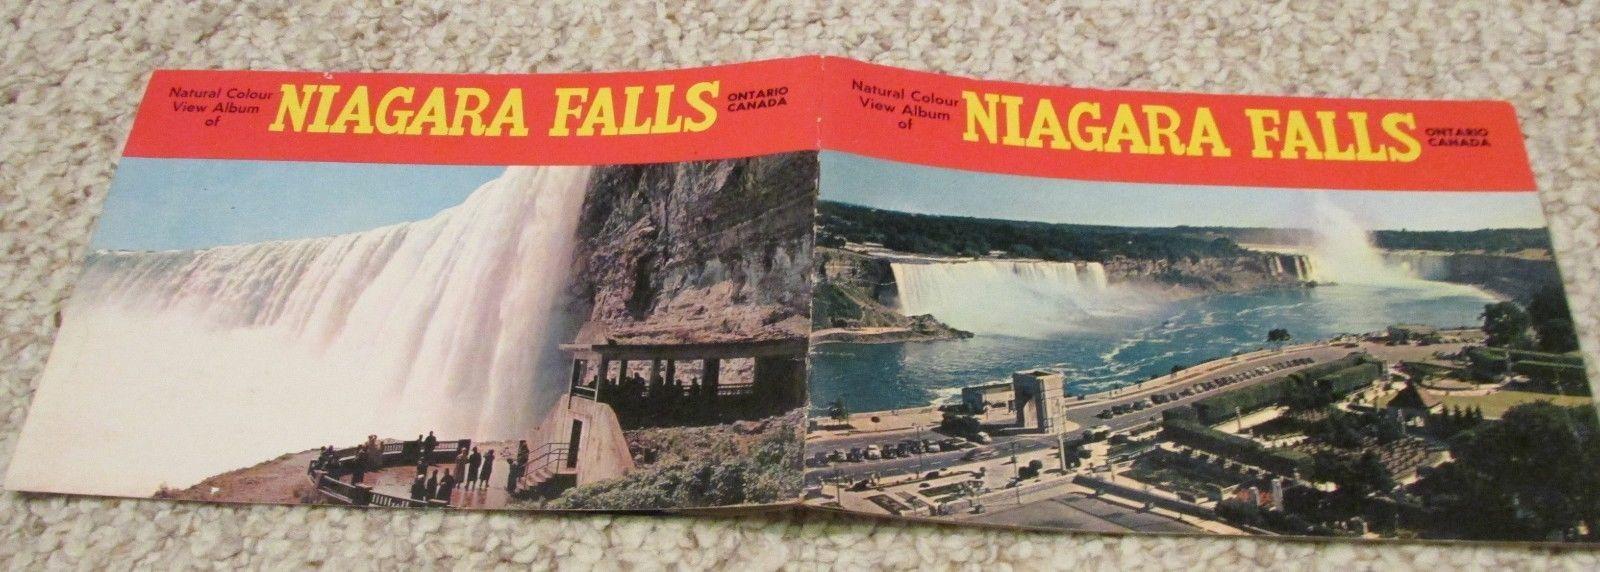 Niagara Falls Horseshoe Canada  Buffalo NY Vintage travel souvenier booklet